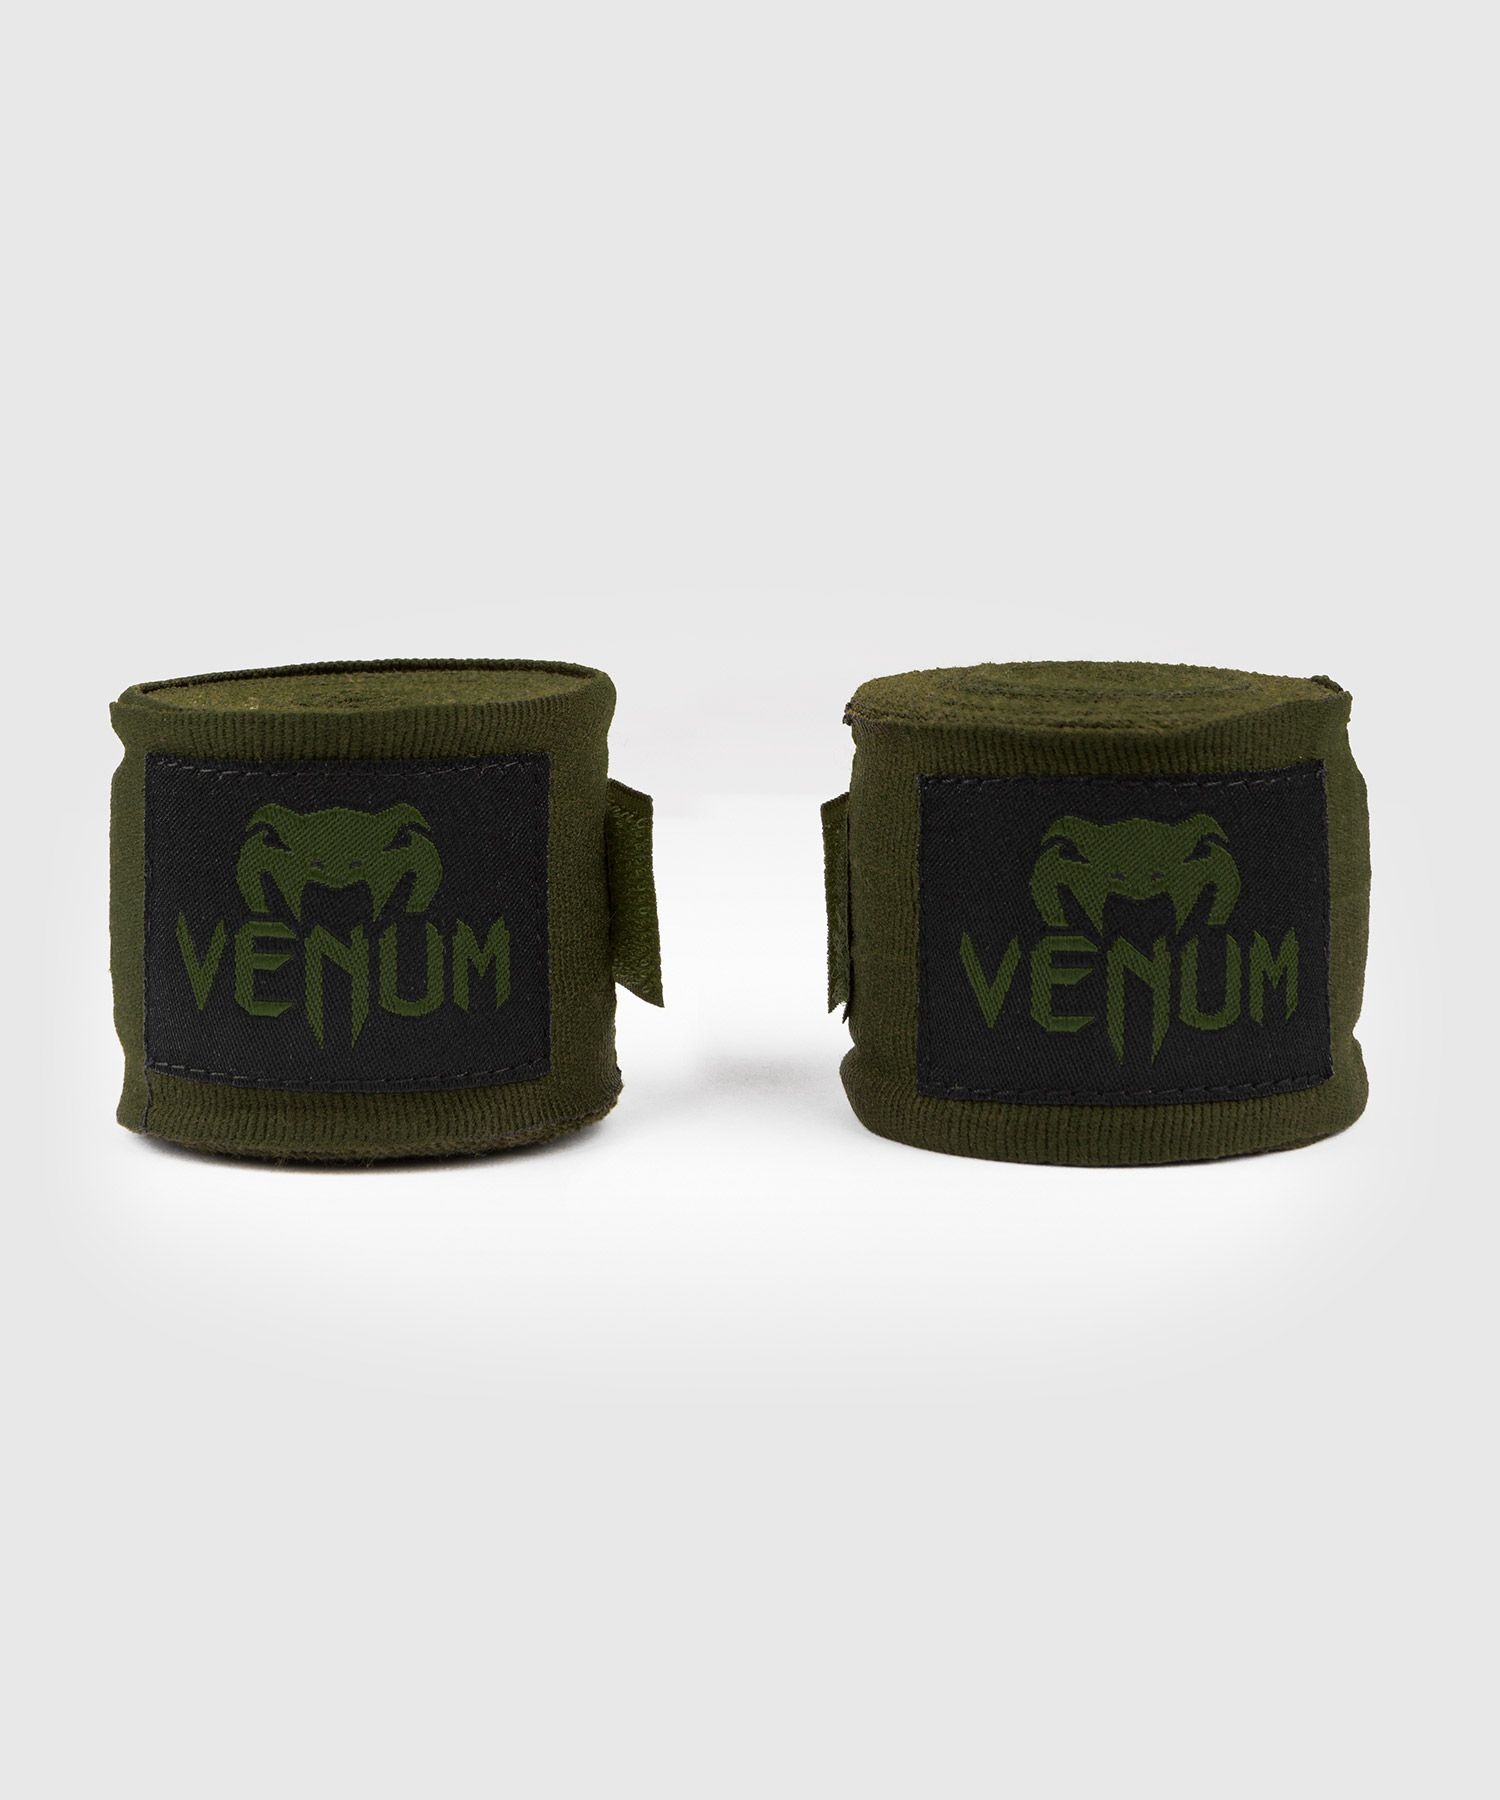 Venum Kontakt Boxbandagen - 4 m - Khaki/Schwarz